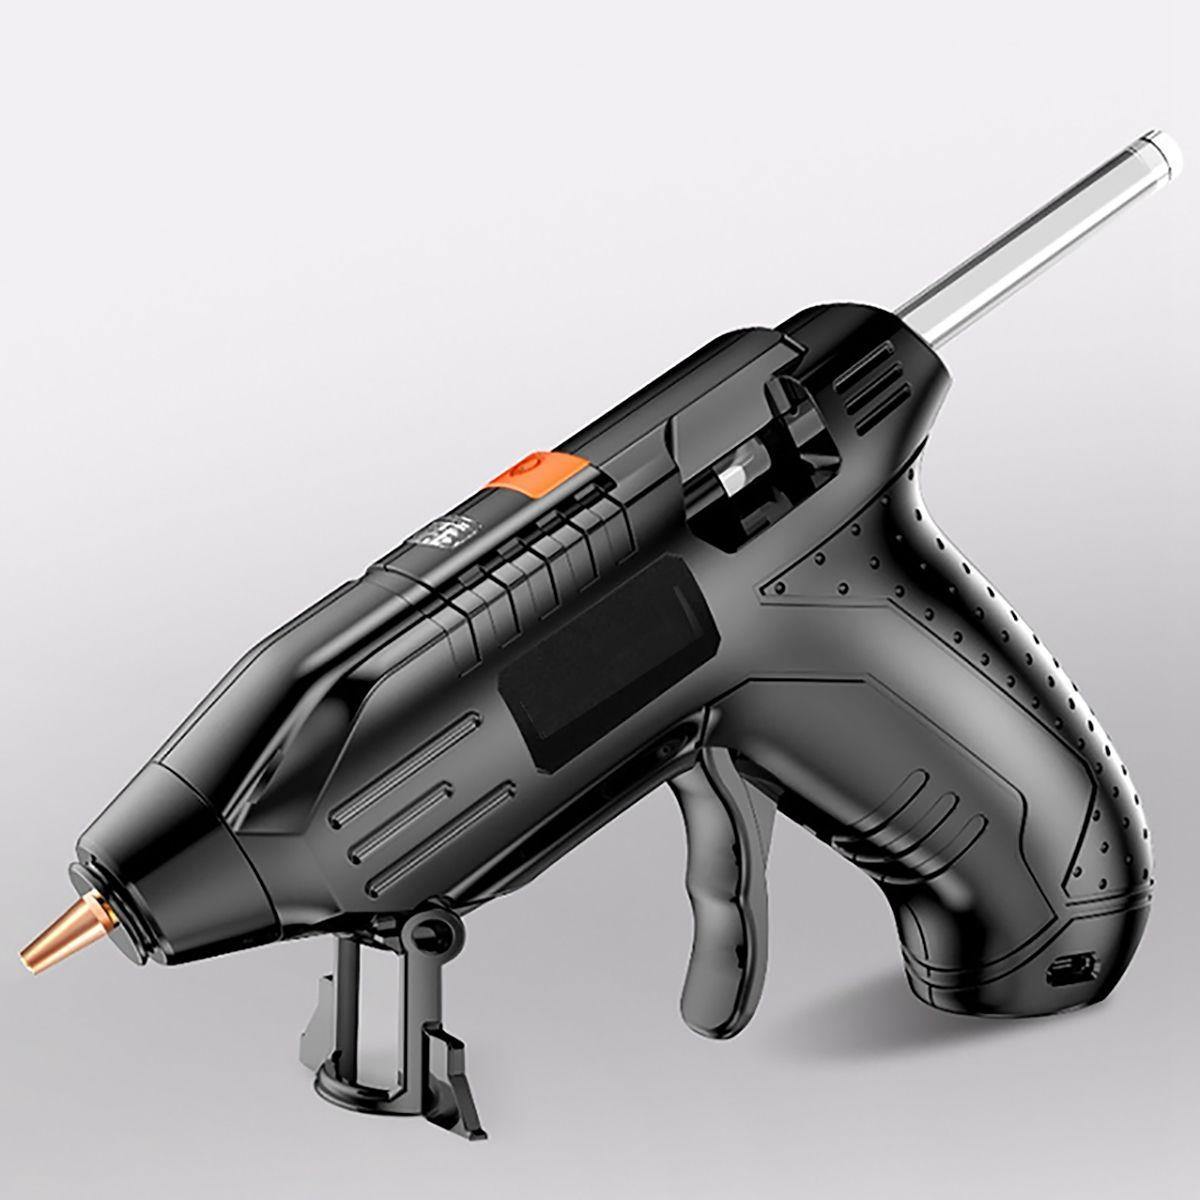 3.6V Cordless Hot Glue-Guns USB Rechargable With 100/40/10 Glue-Sticks Melt Glue-Gun Kits Lithium-ion Wireless Hot Glue Gun Home